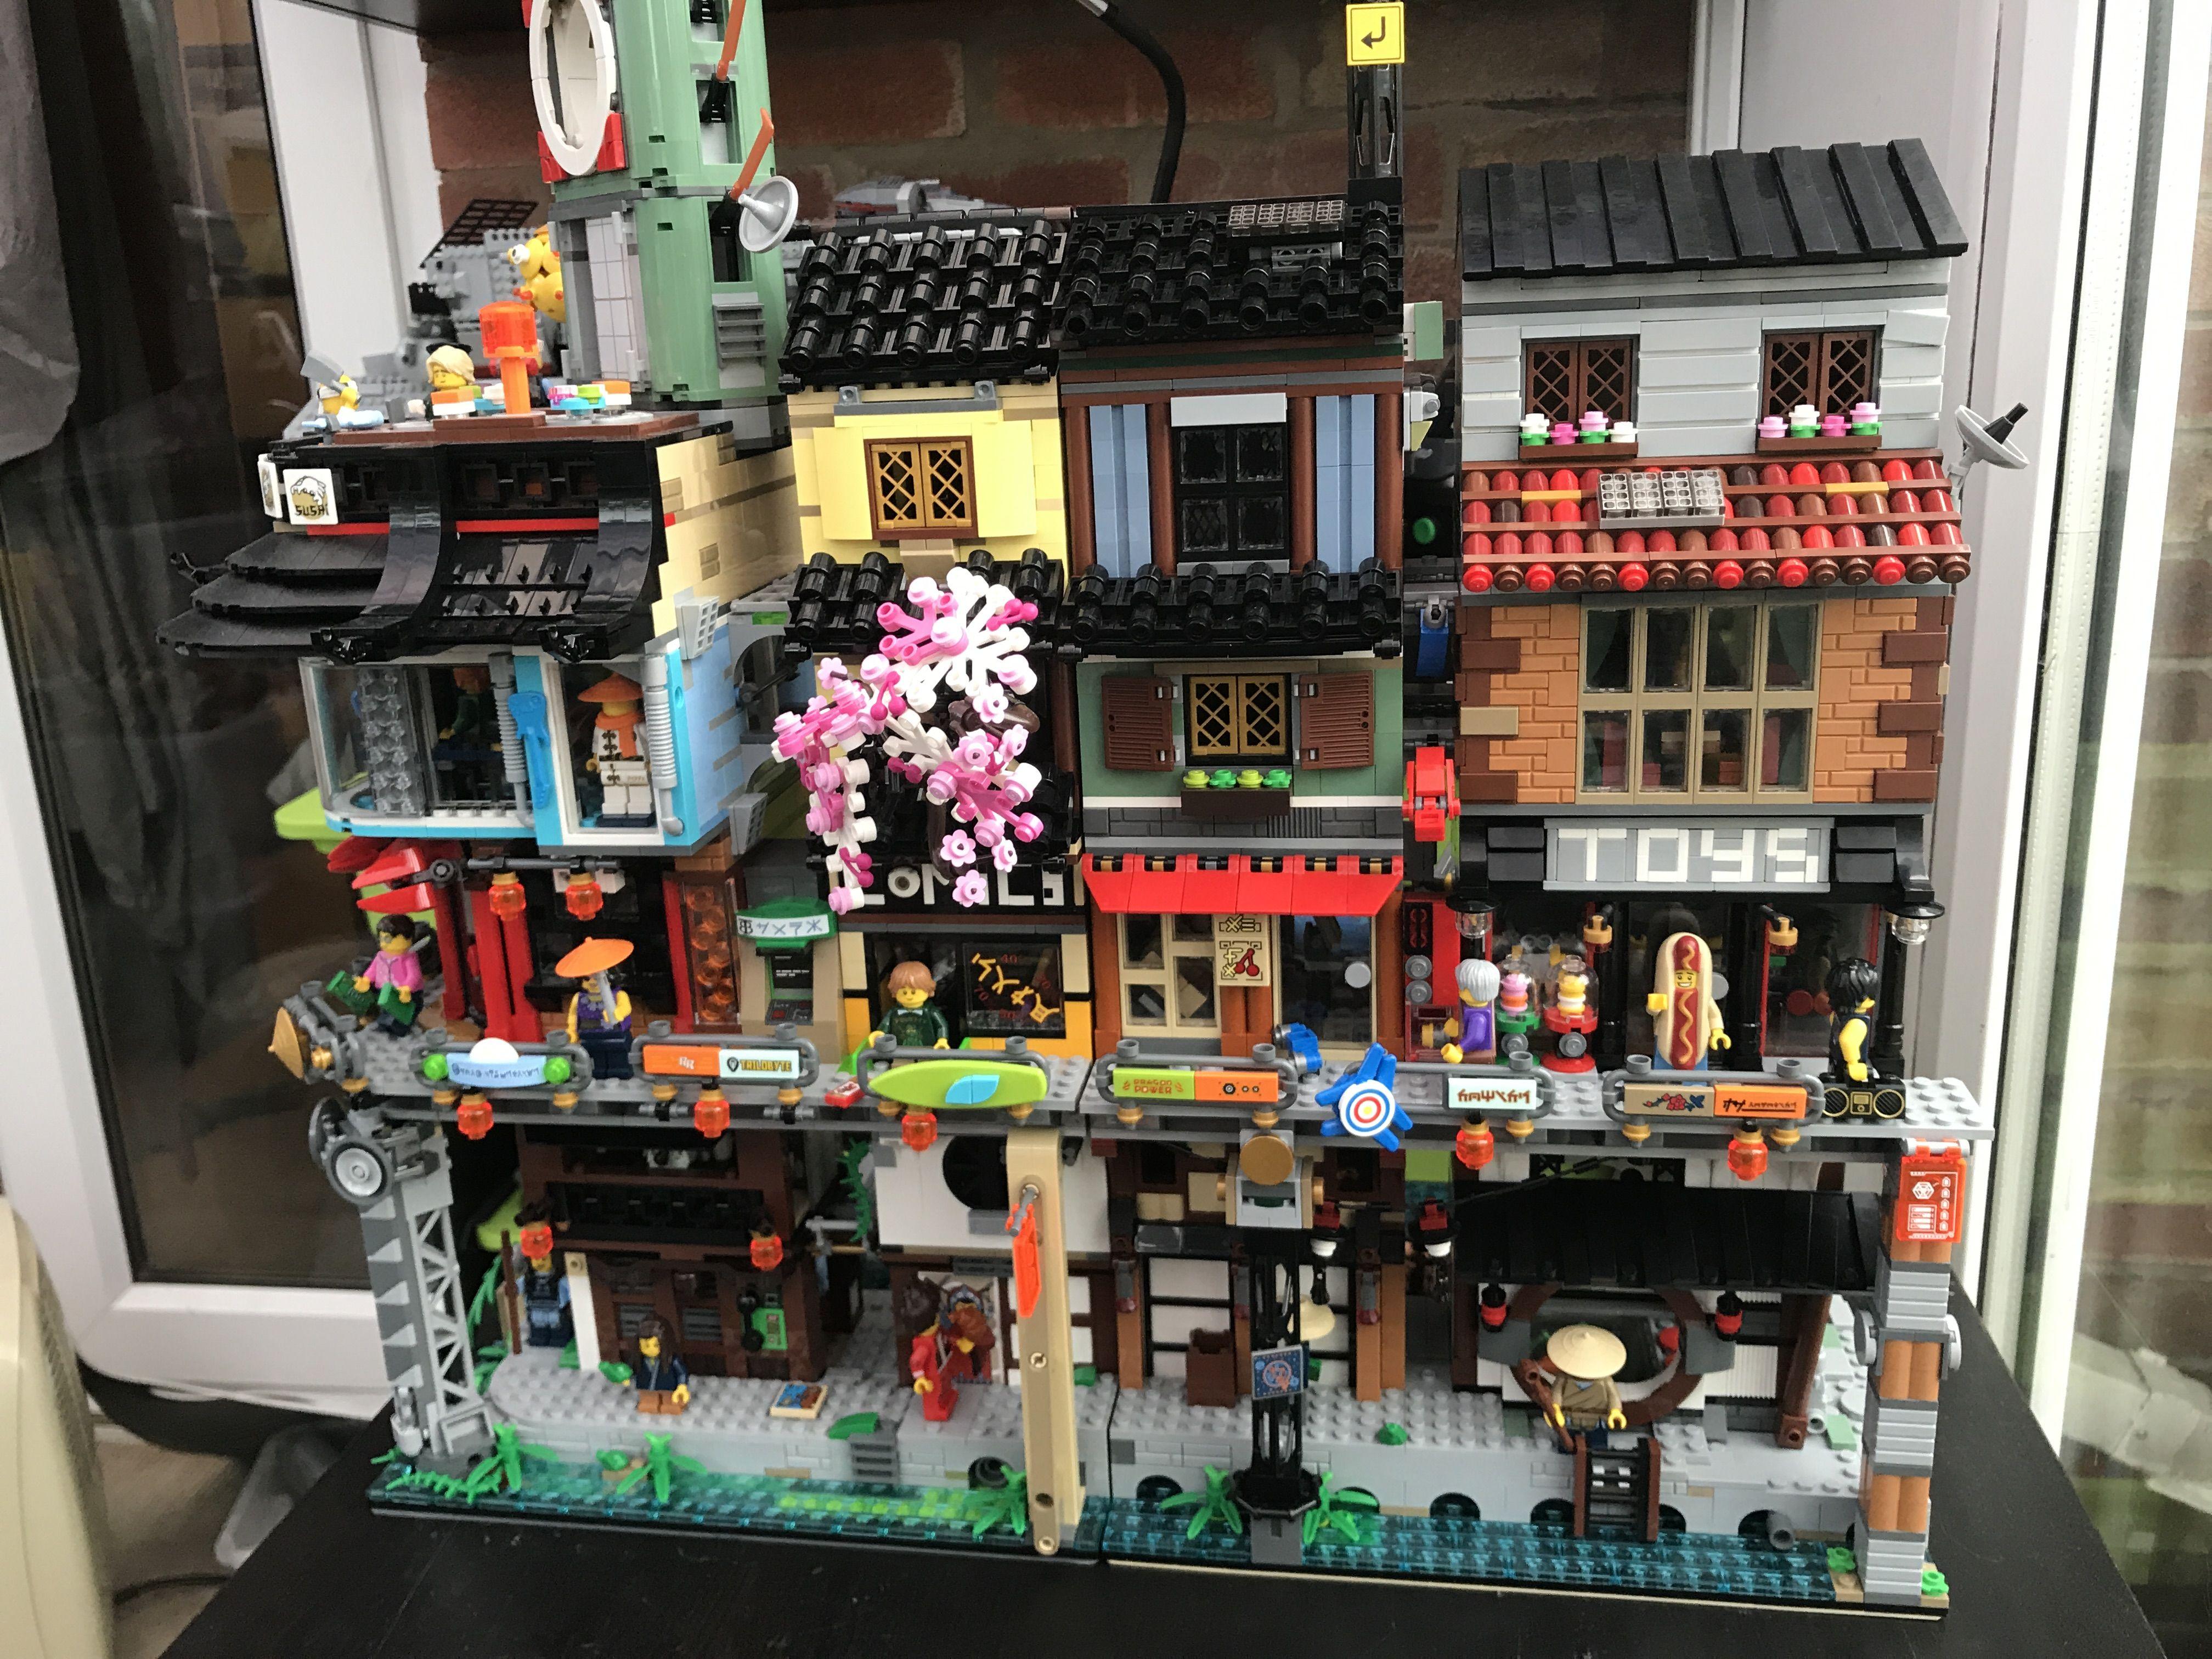 Https I Imgur Com Petswgk Jpg Lego Ninjago City Lego Lego Architecture